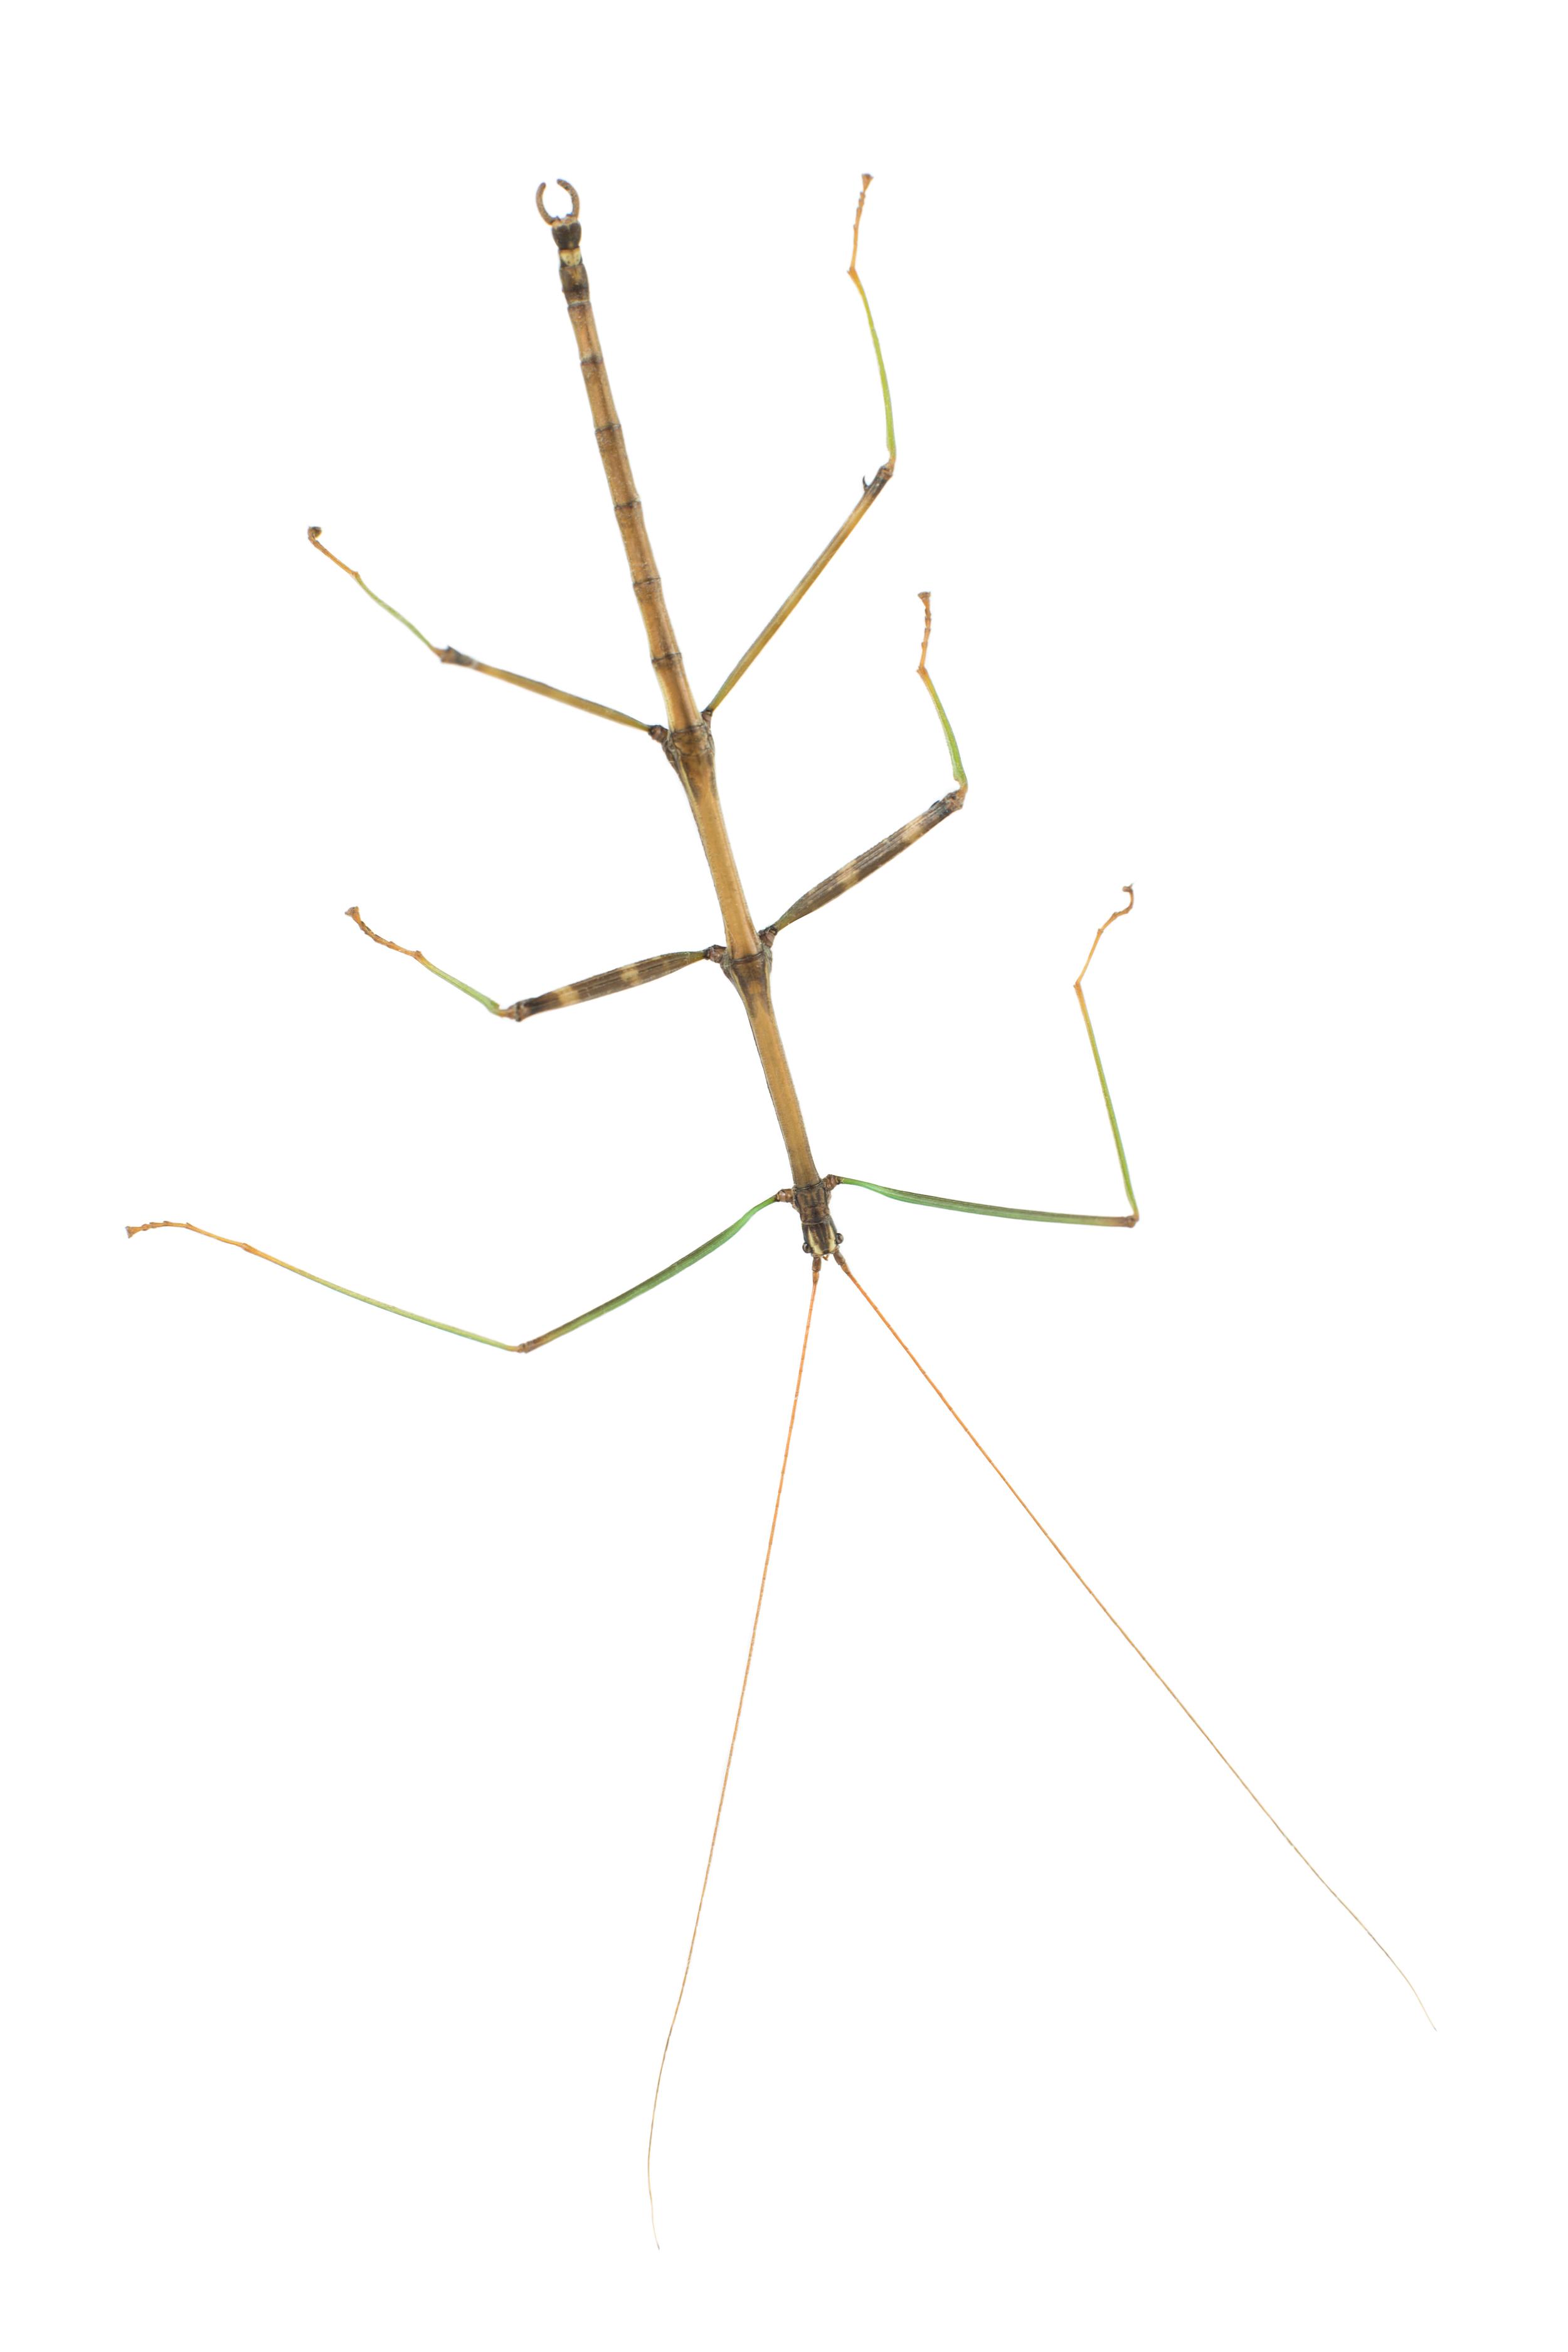 Diapheromera femorata- Common Walkingstick